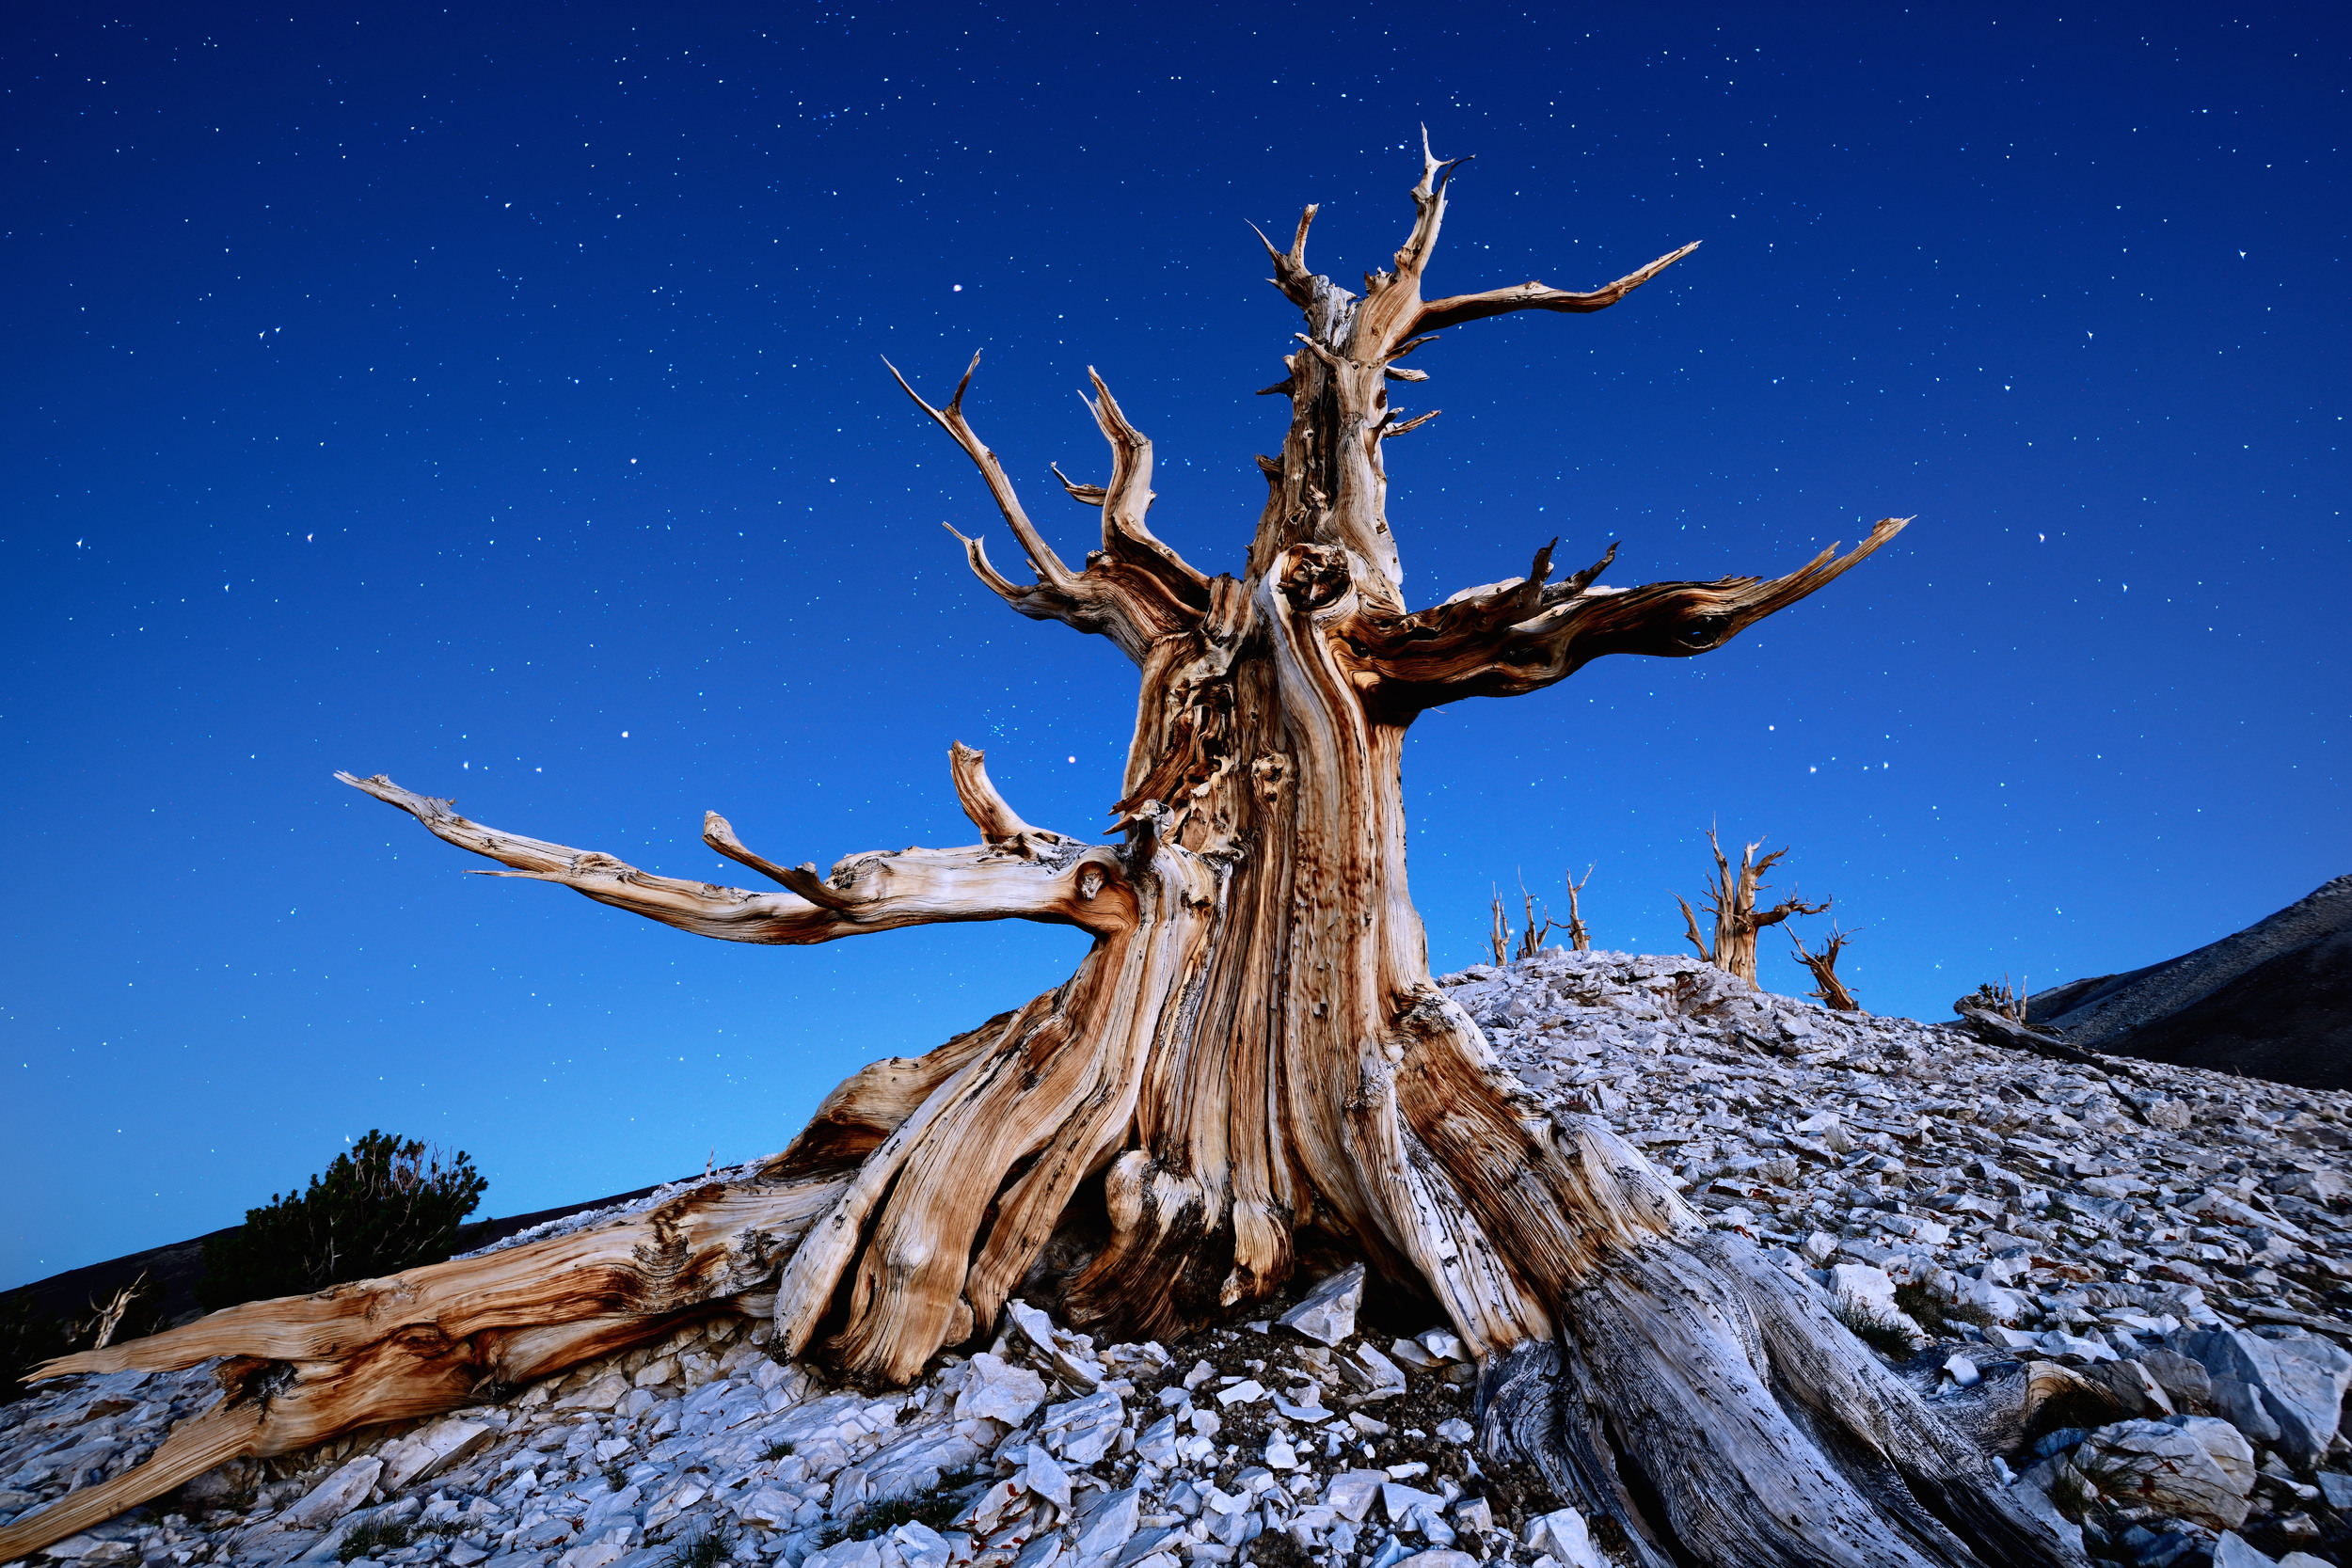 A Bristlecone Pine Under Starry Skies –(PHOTO:Tomas Tichy/SHUTTERSTOCK)